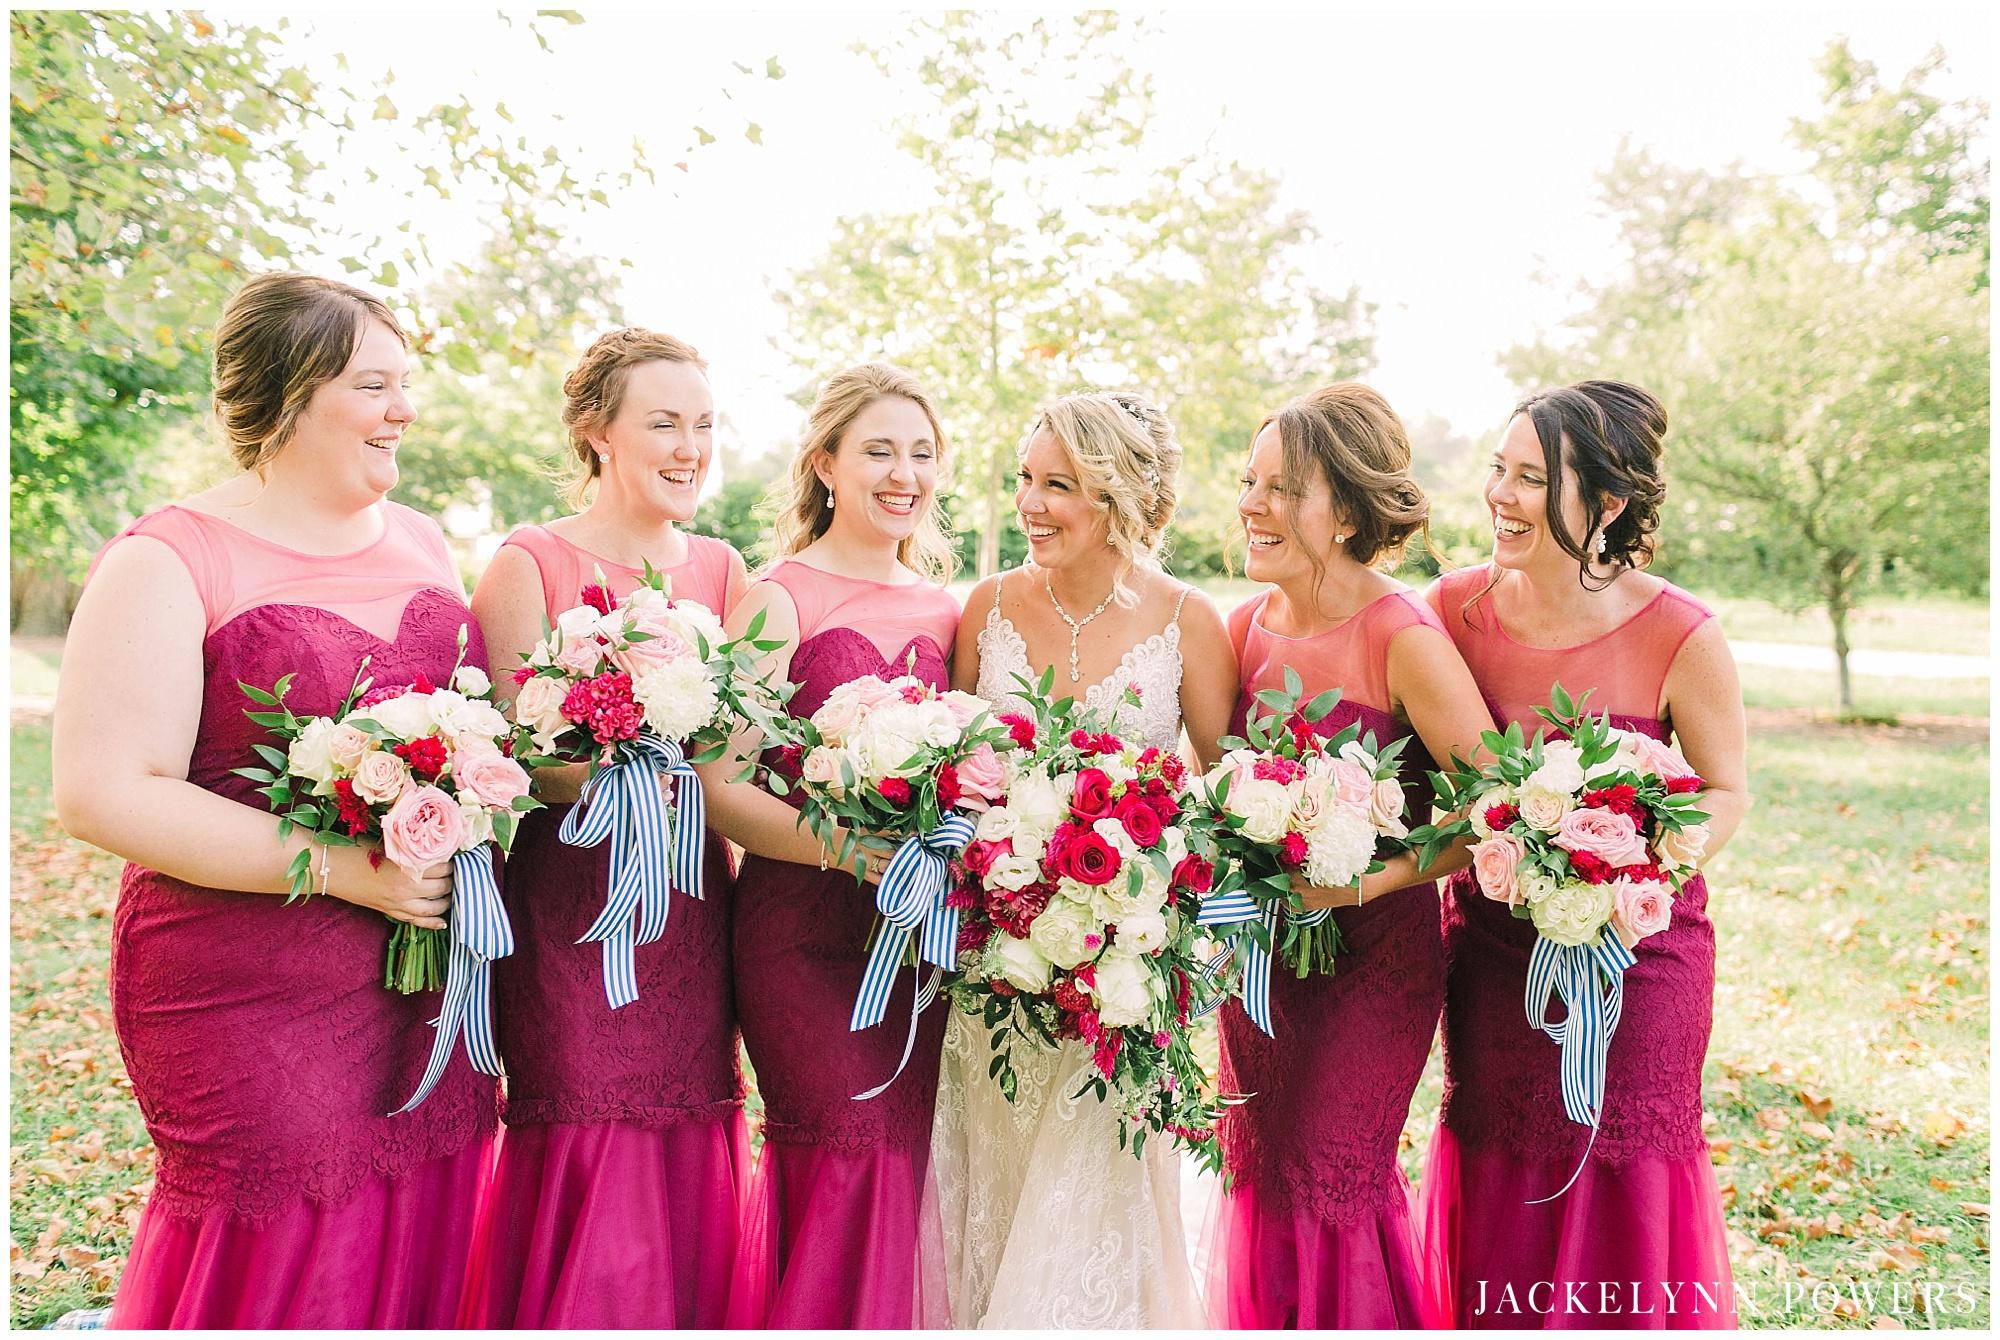 Forest Park Wedding Photos, St. Louis Wedding Photographer, Jackelynn Noel Photography